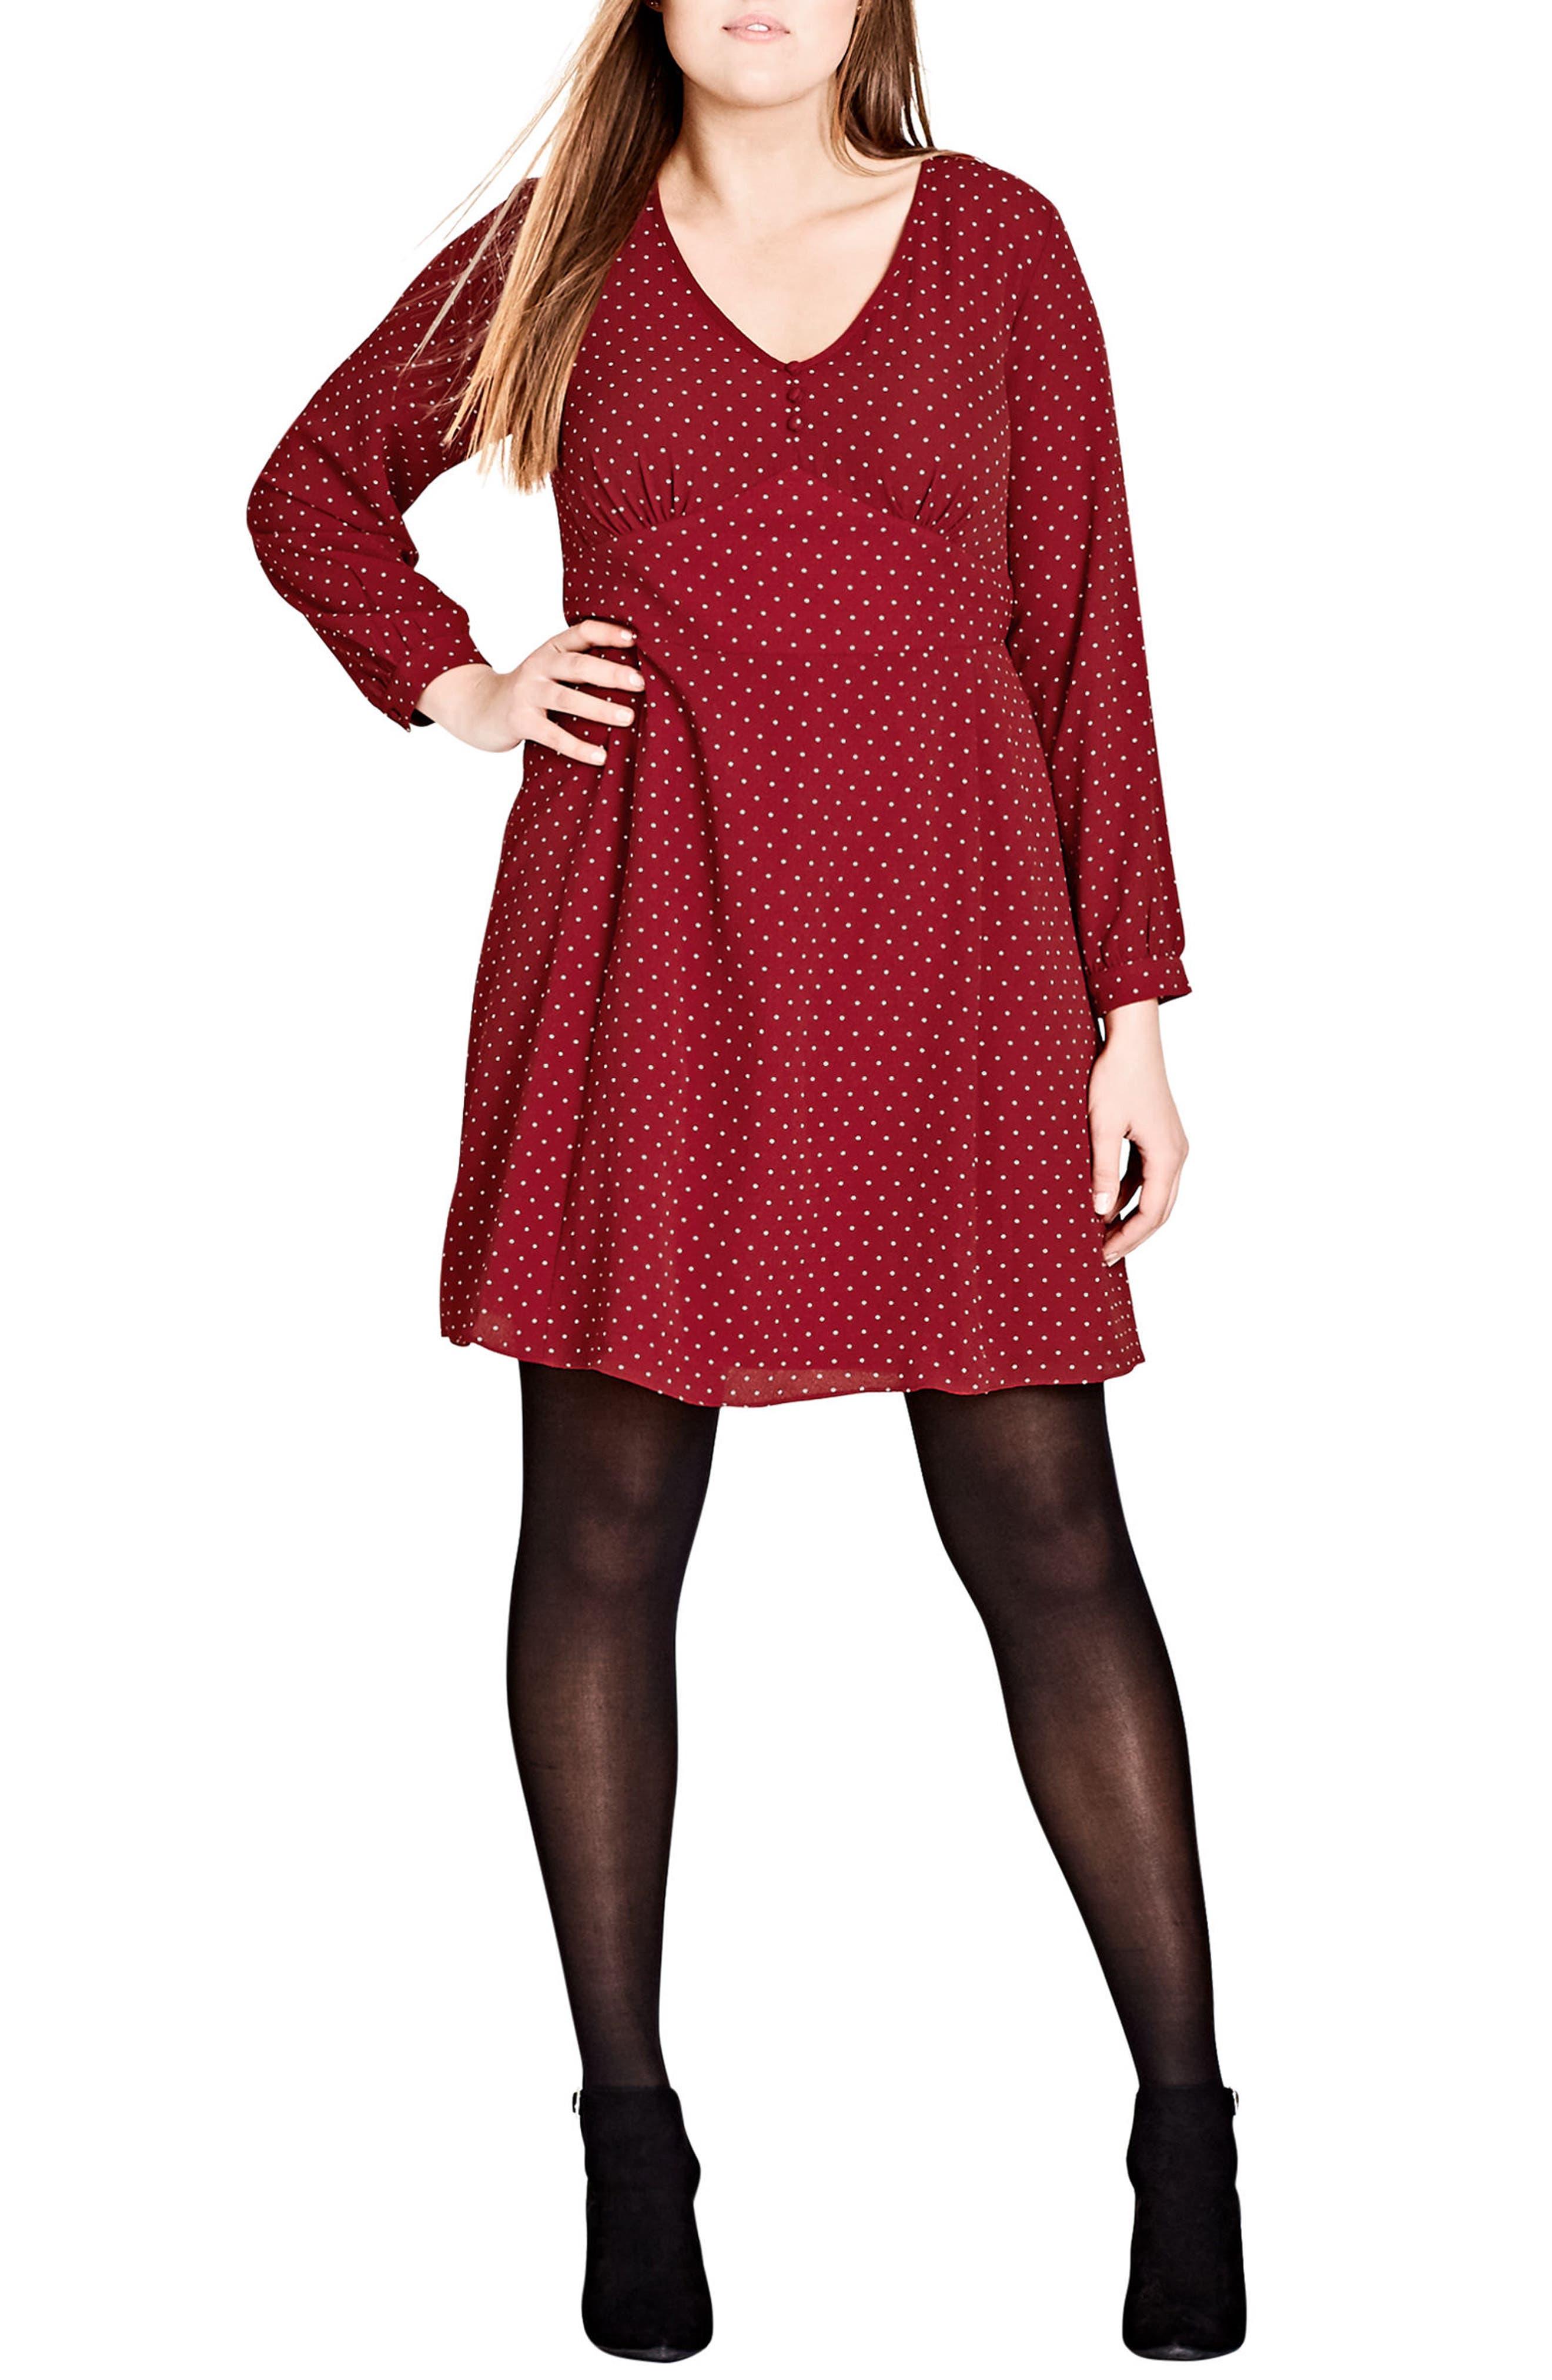 Main Image - City Chic Sweet Nothing Polka Dot Dress (Plus Size)